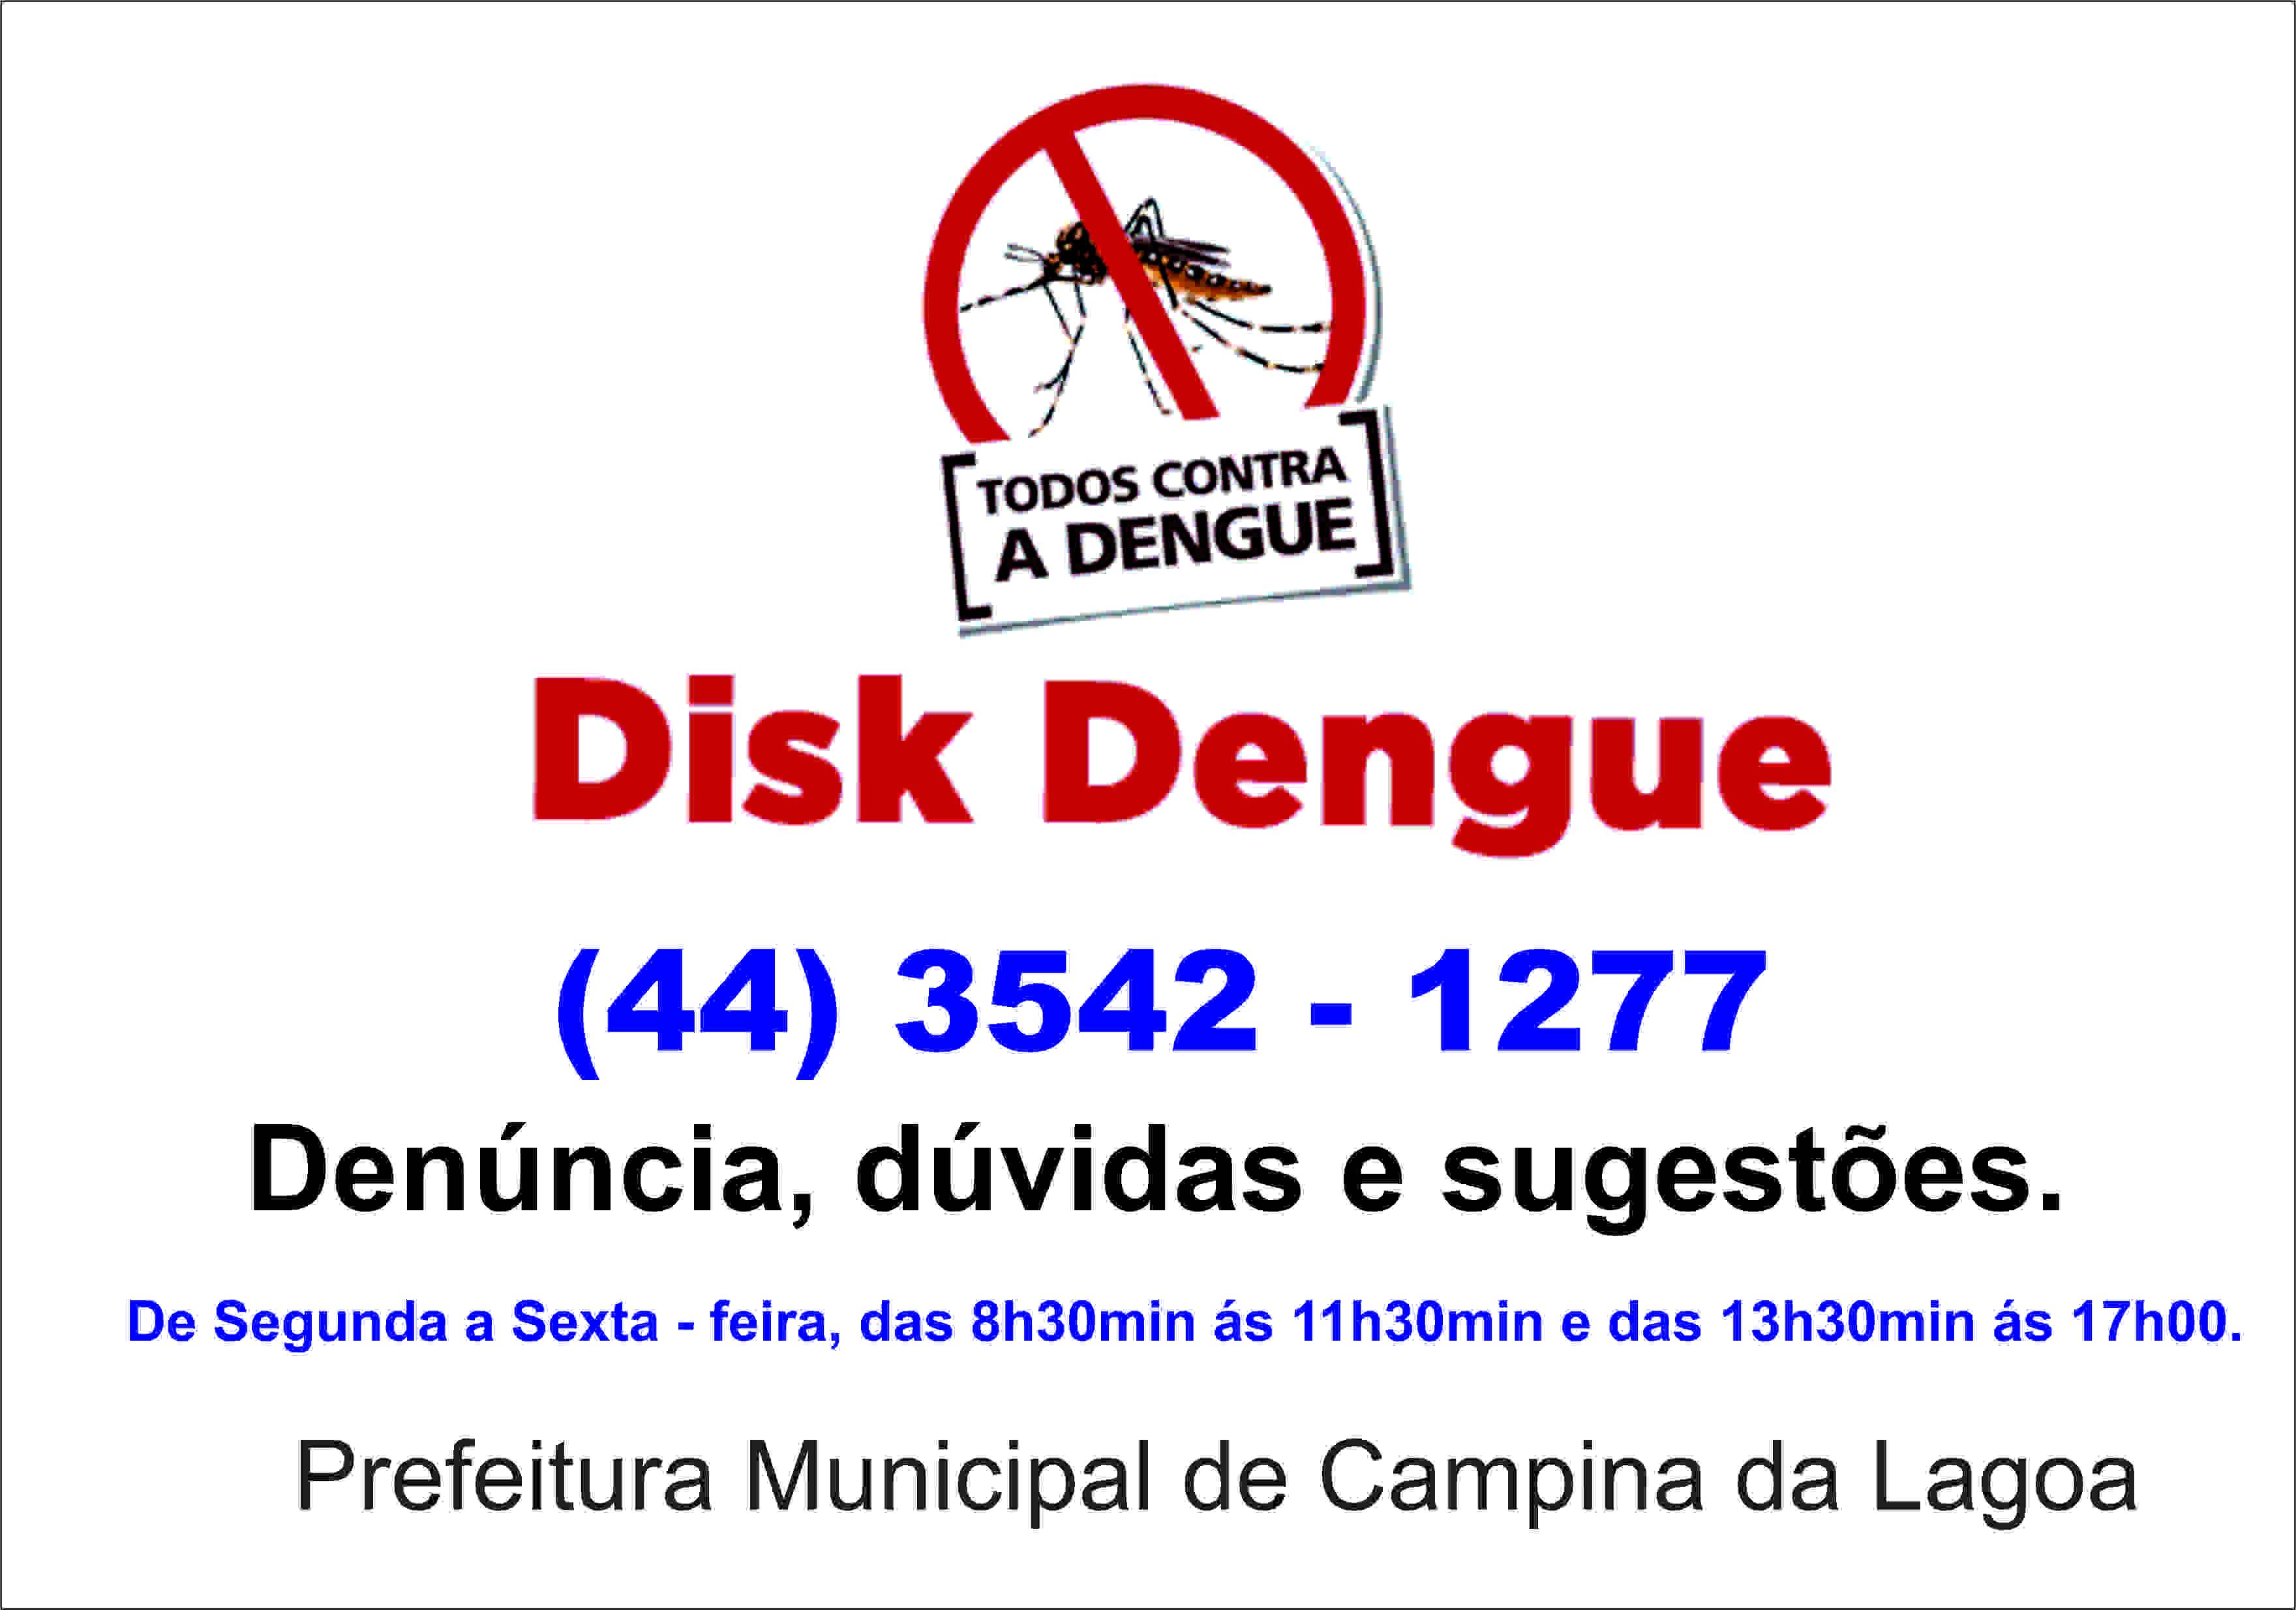 Disk Dengue